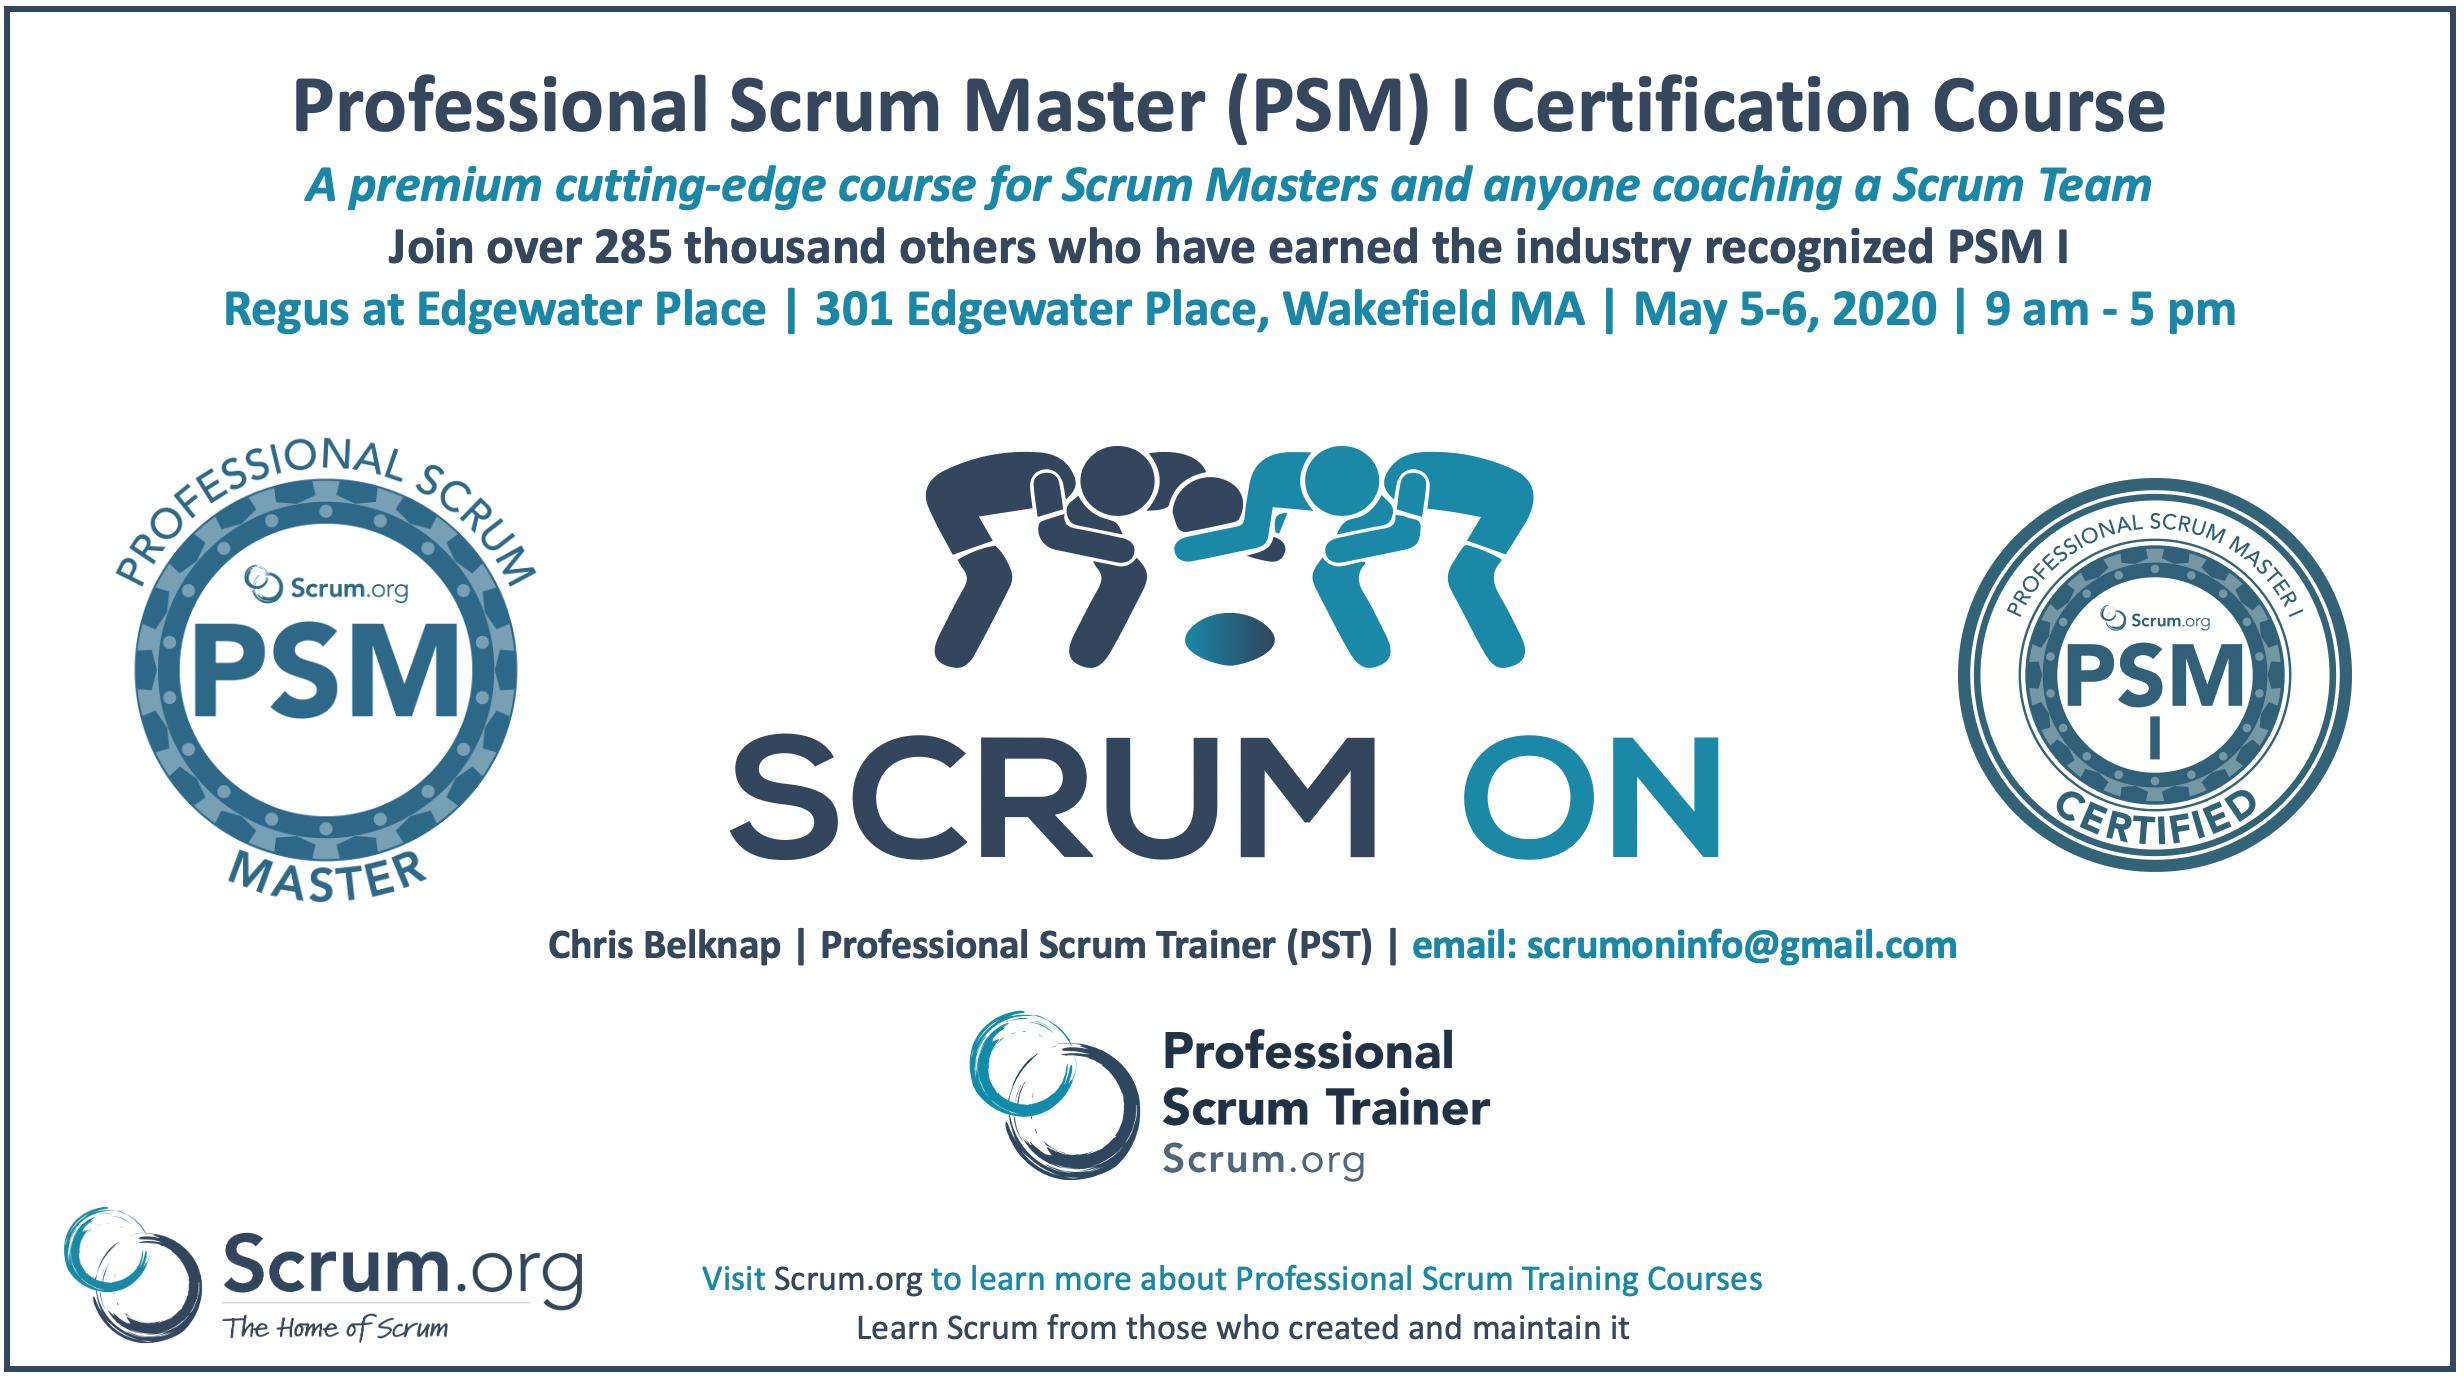 Professional Scrum Master PSM I Training Wakefield MA